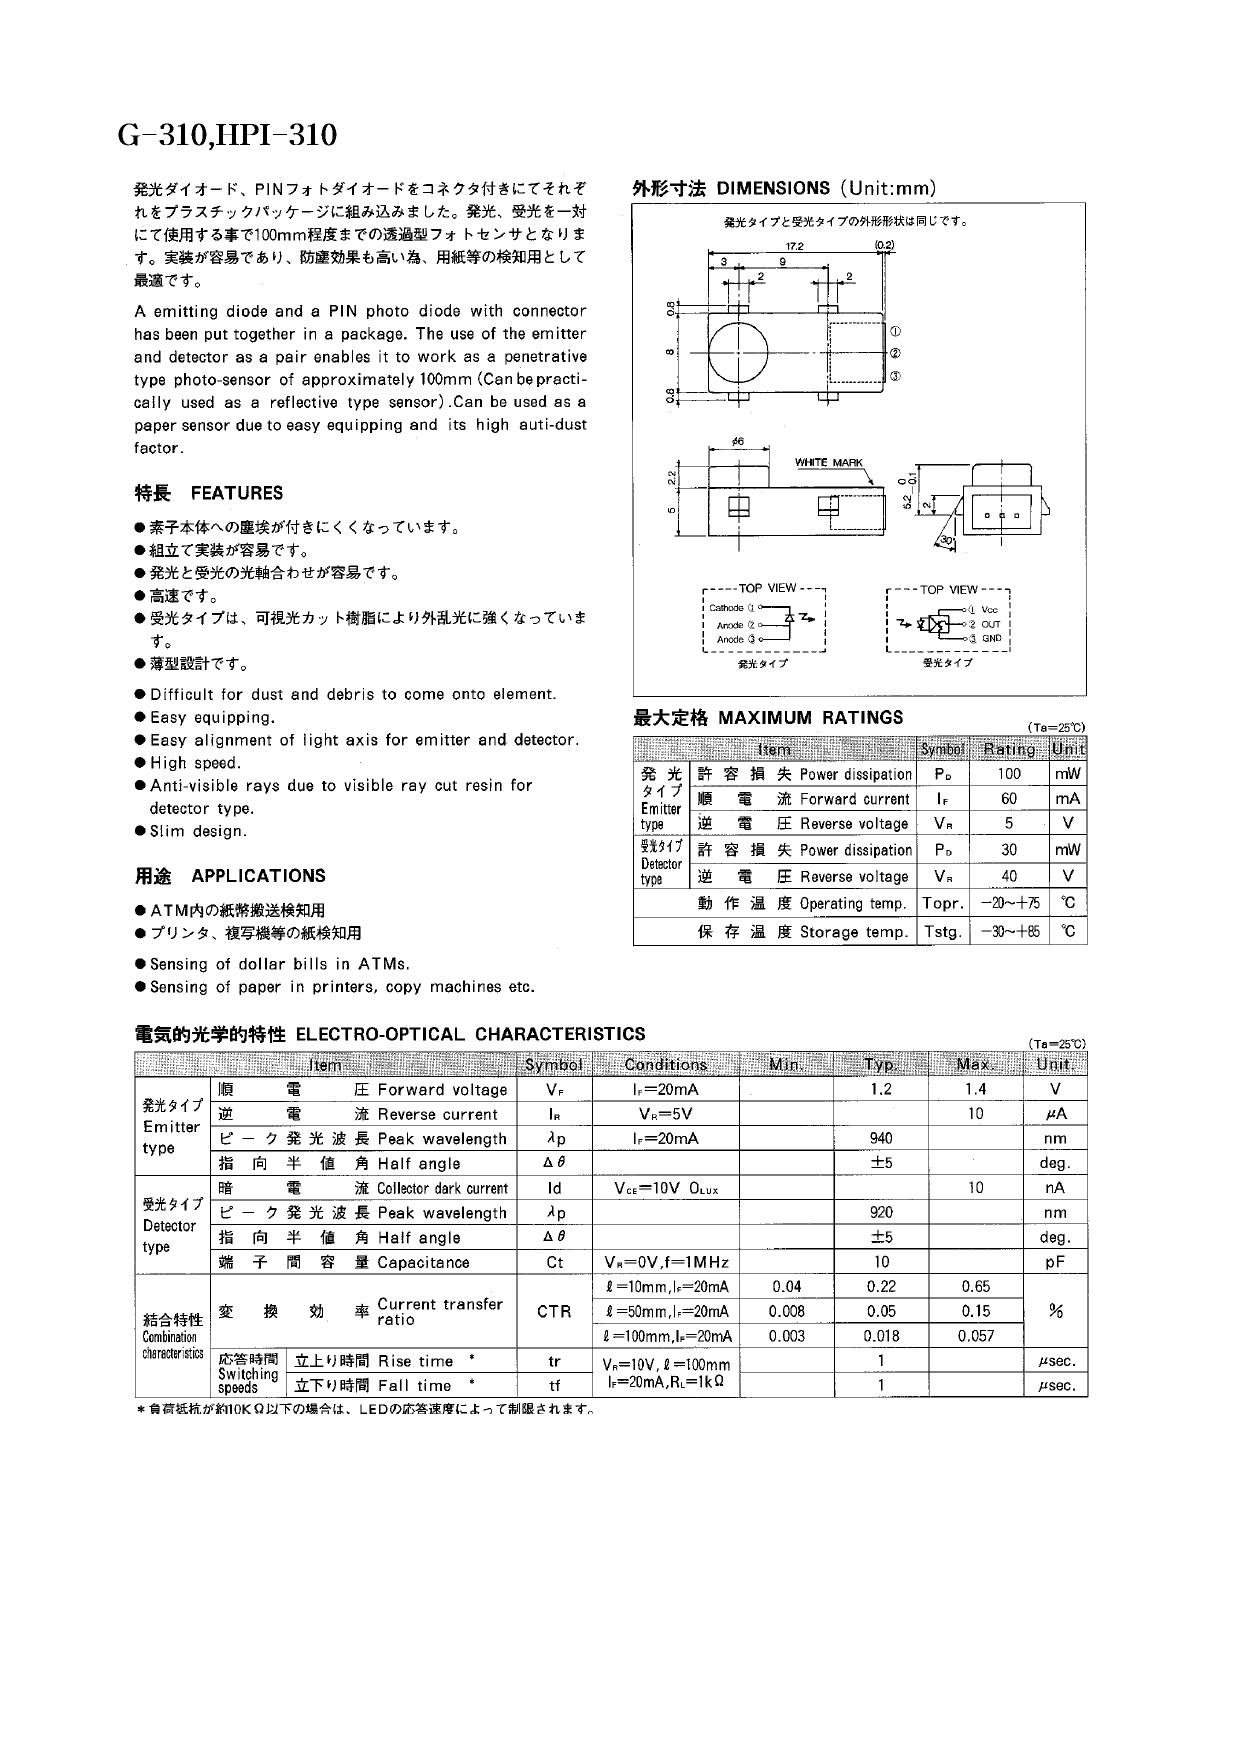 G-310 pdf